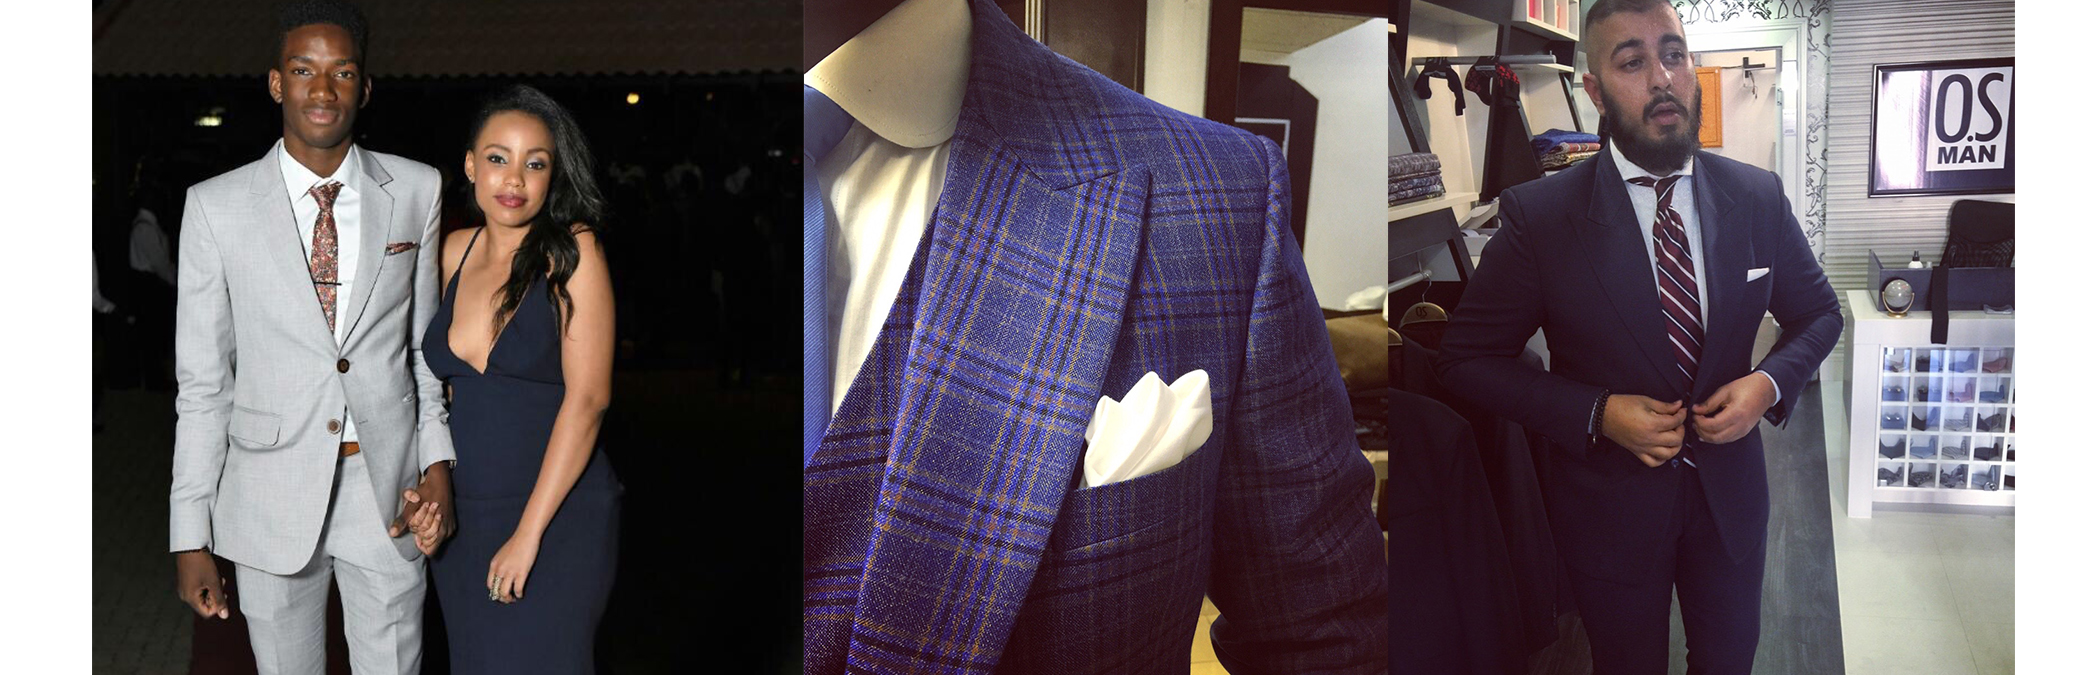 tailored suit slider 3